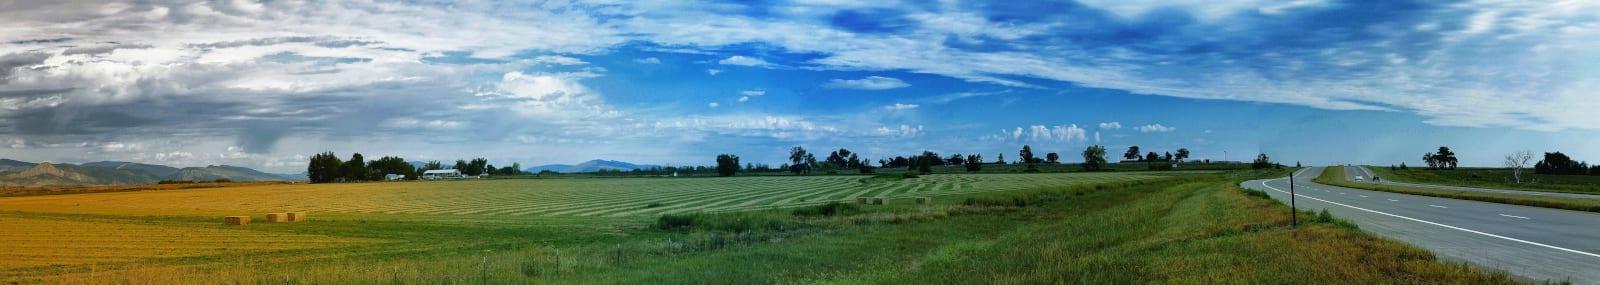 Berthoud Colorado Farm